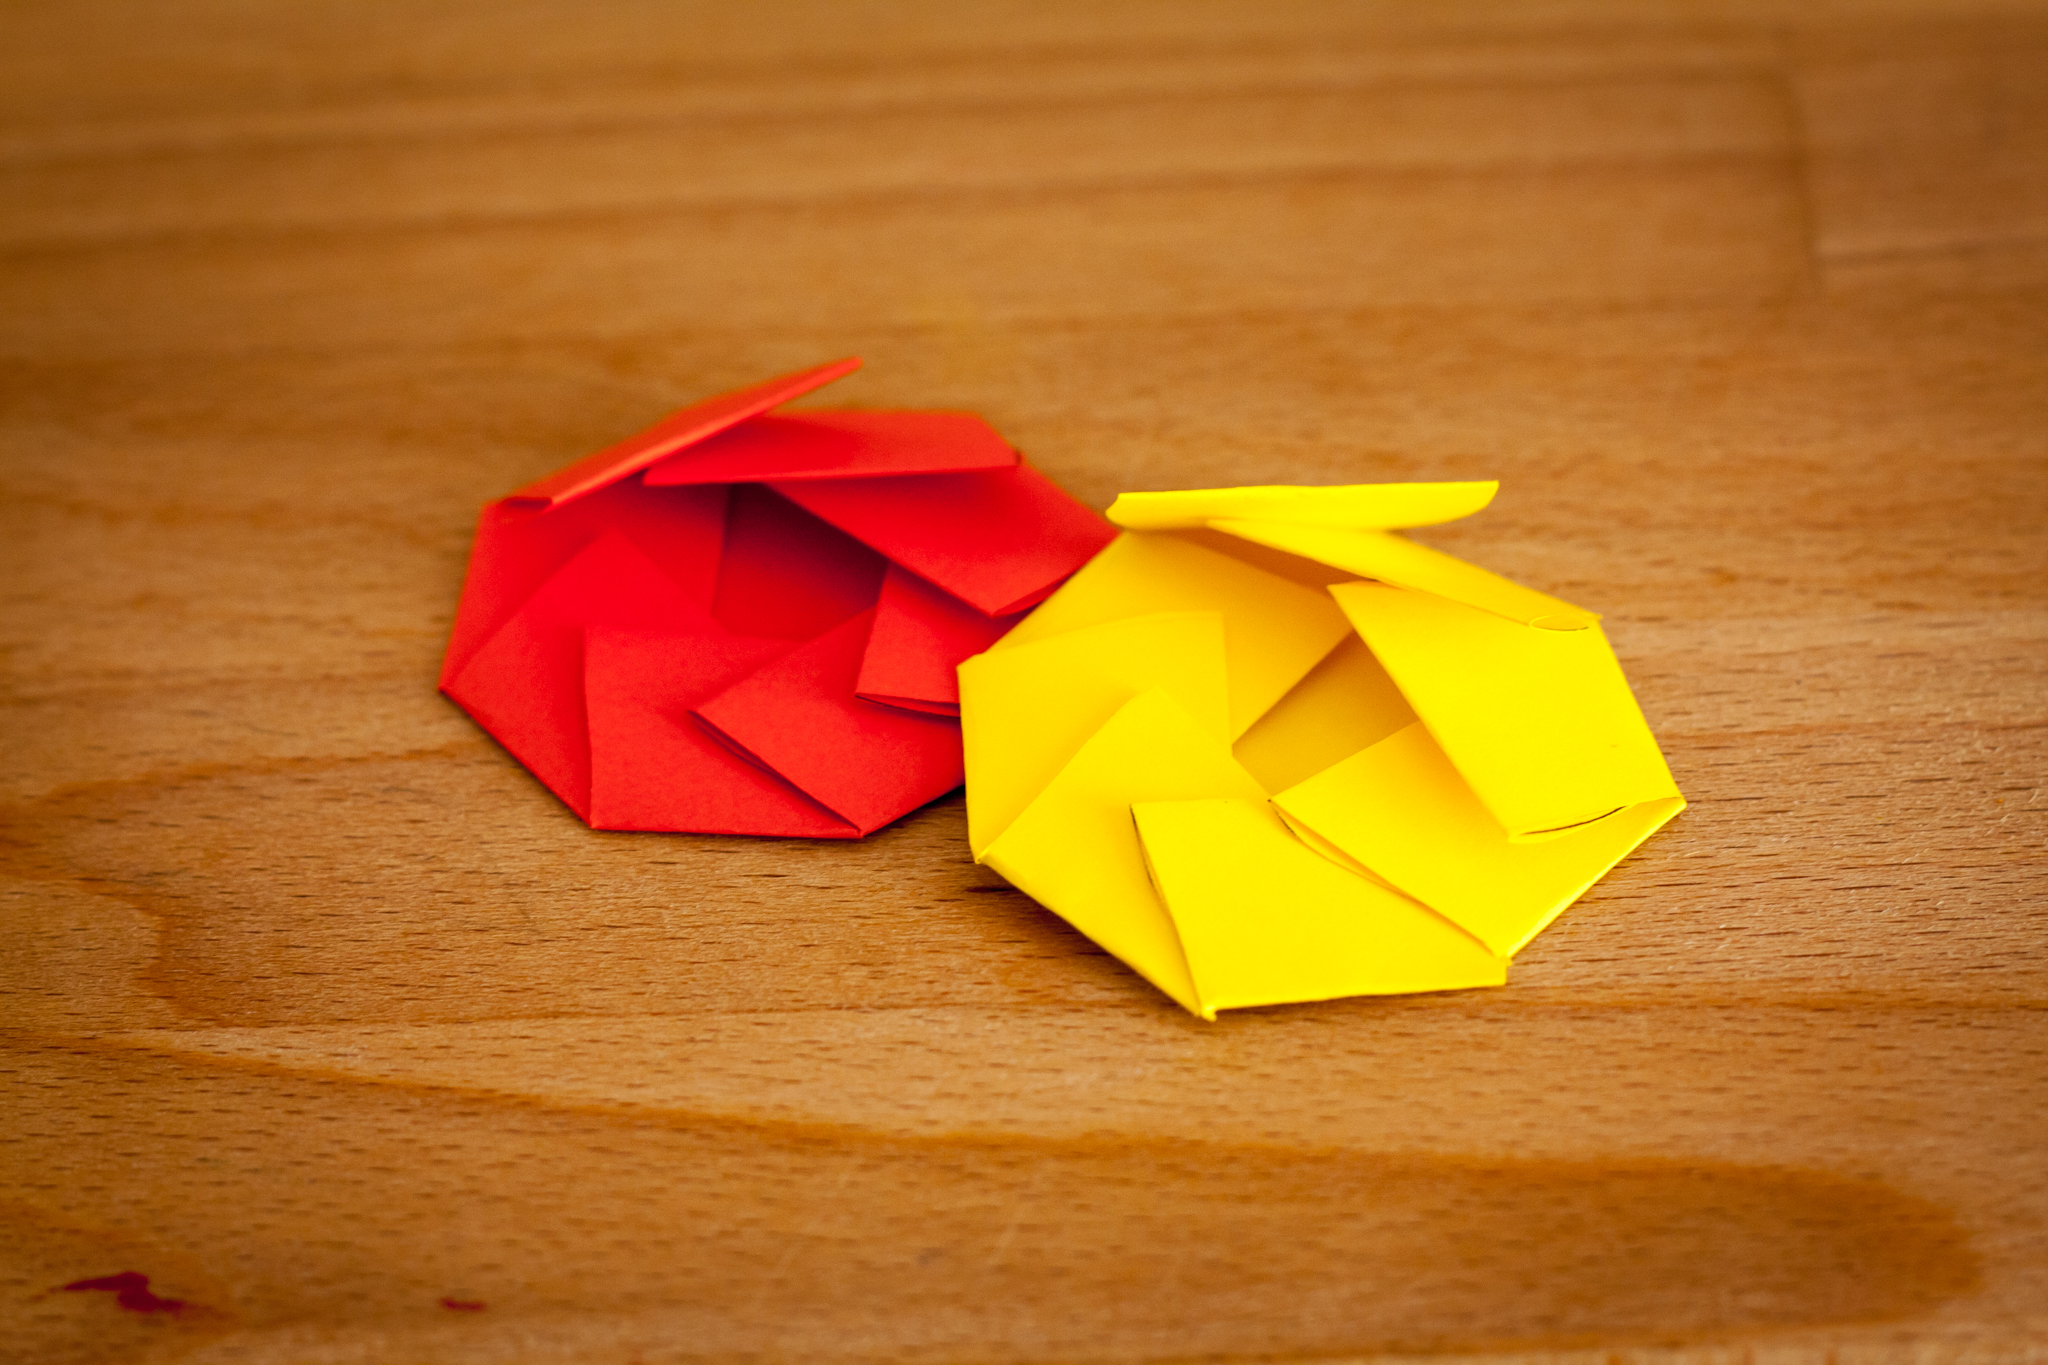 Papierseerosen Selbstgebastelt Unser Kreativblog